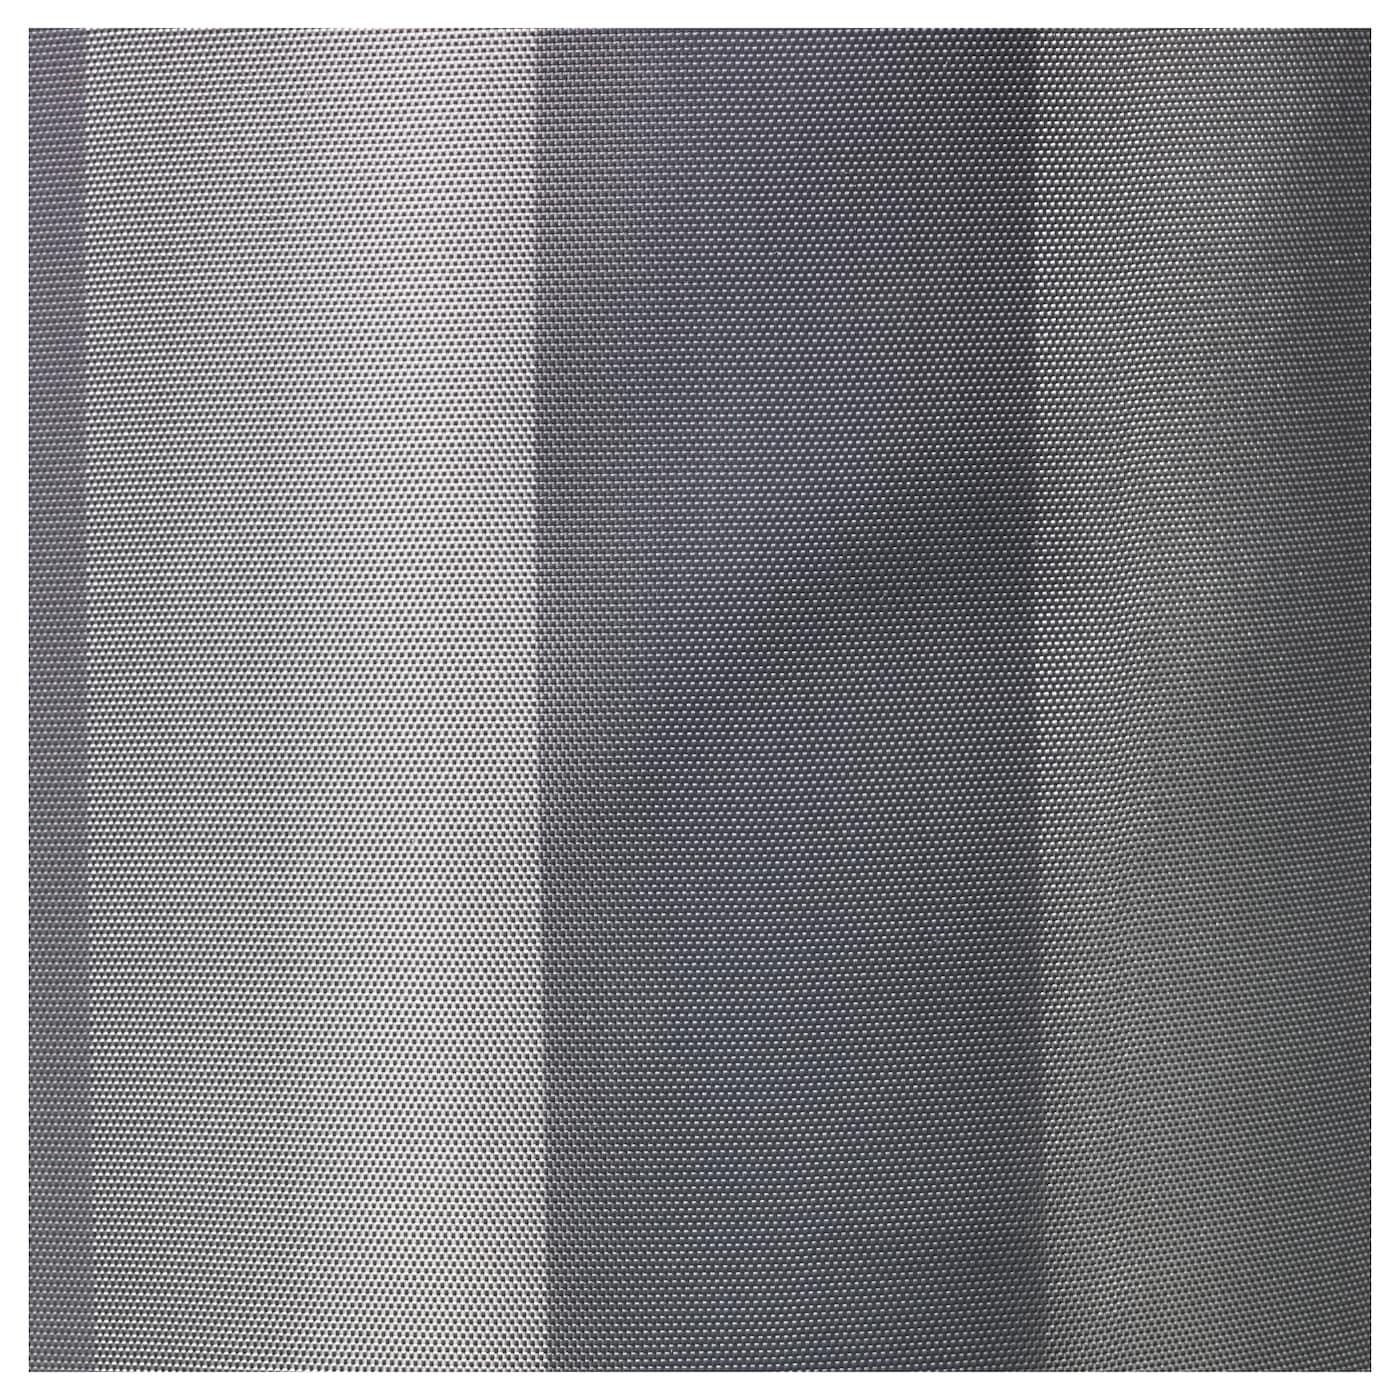 saltgrund rideau de douche gris 180 x 200 cm ikea. Black Bedroom Furniture Sets. Home Design Ideas